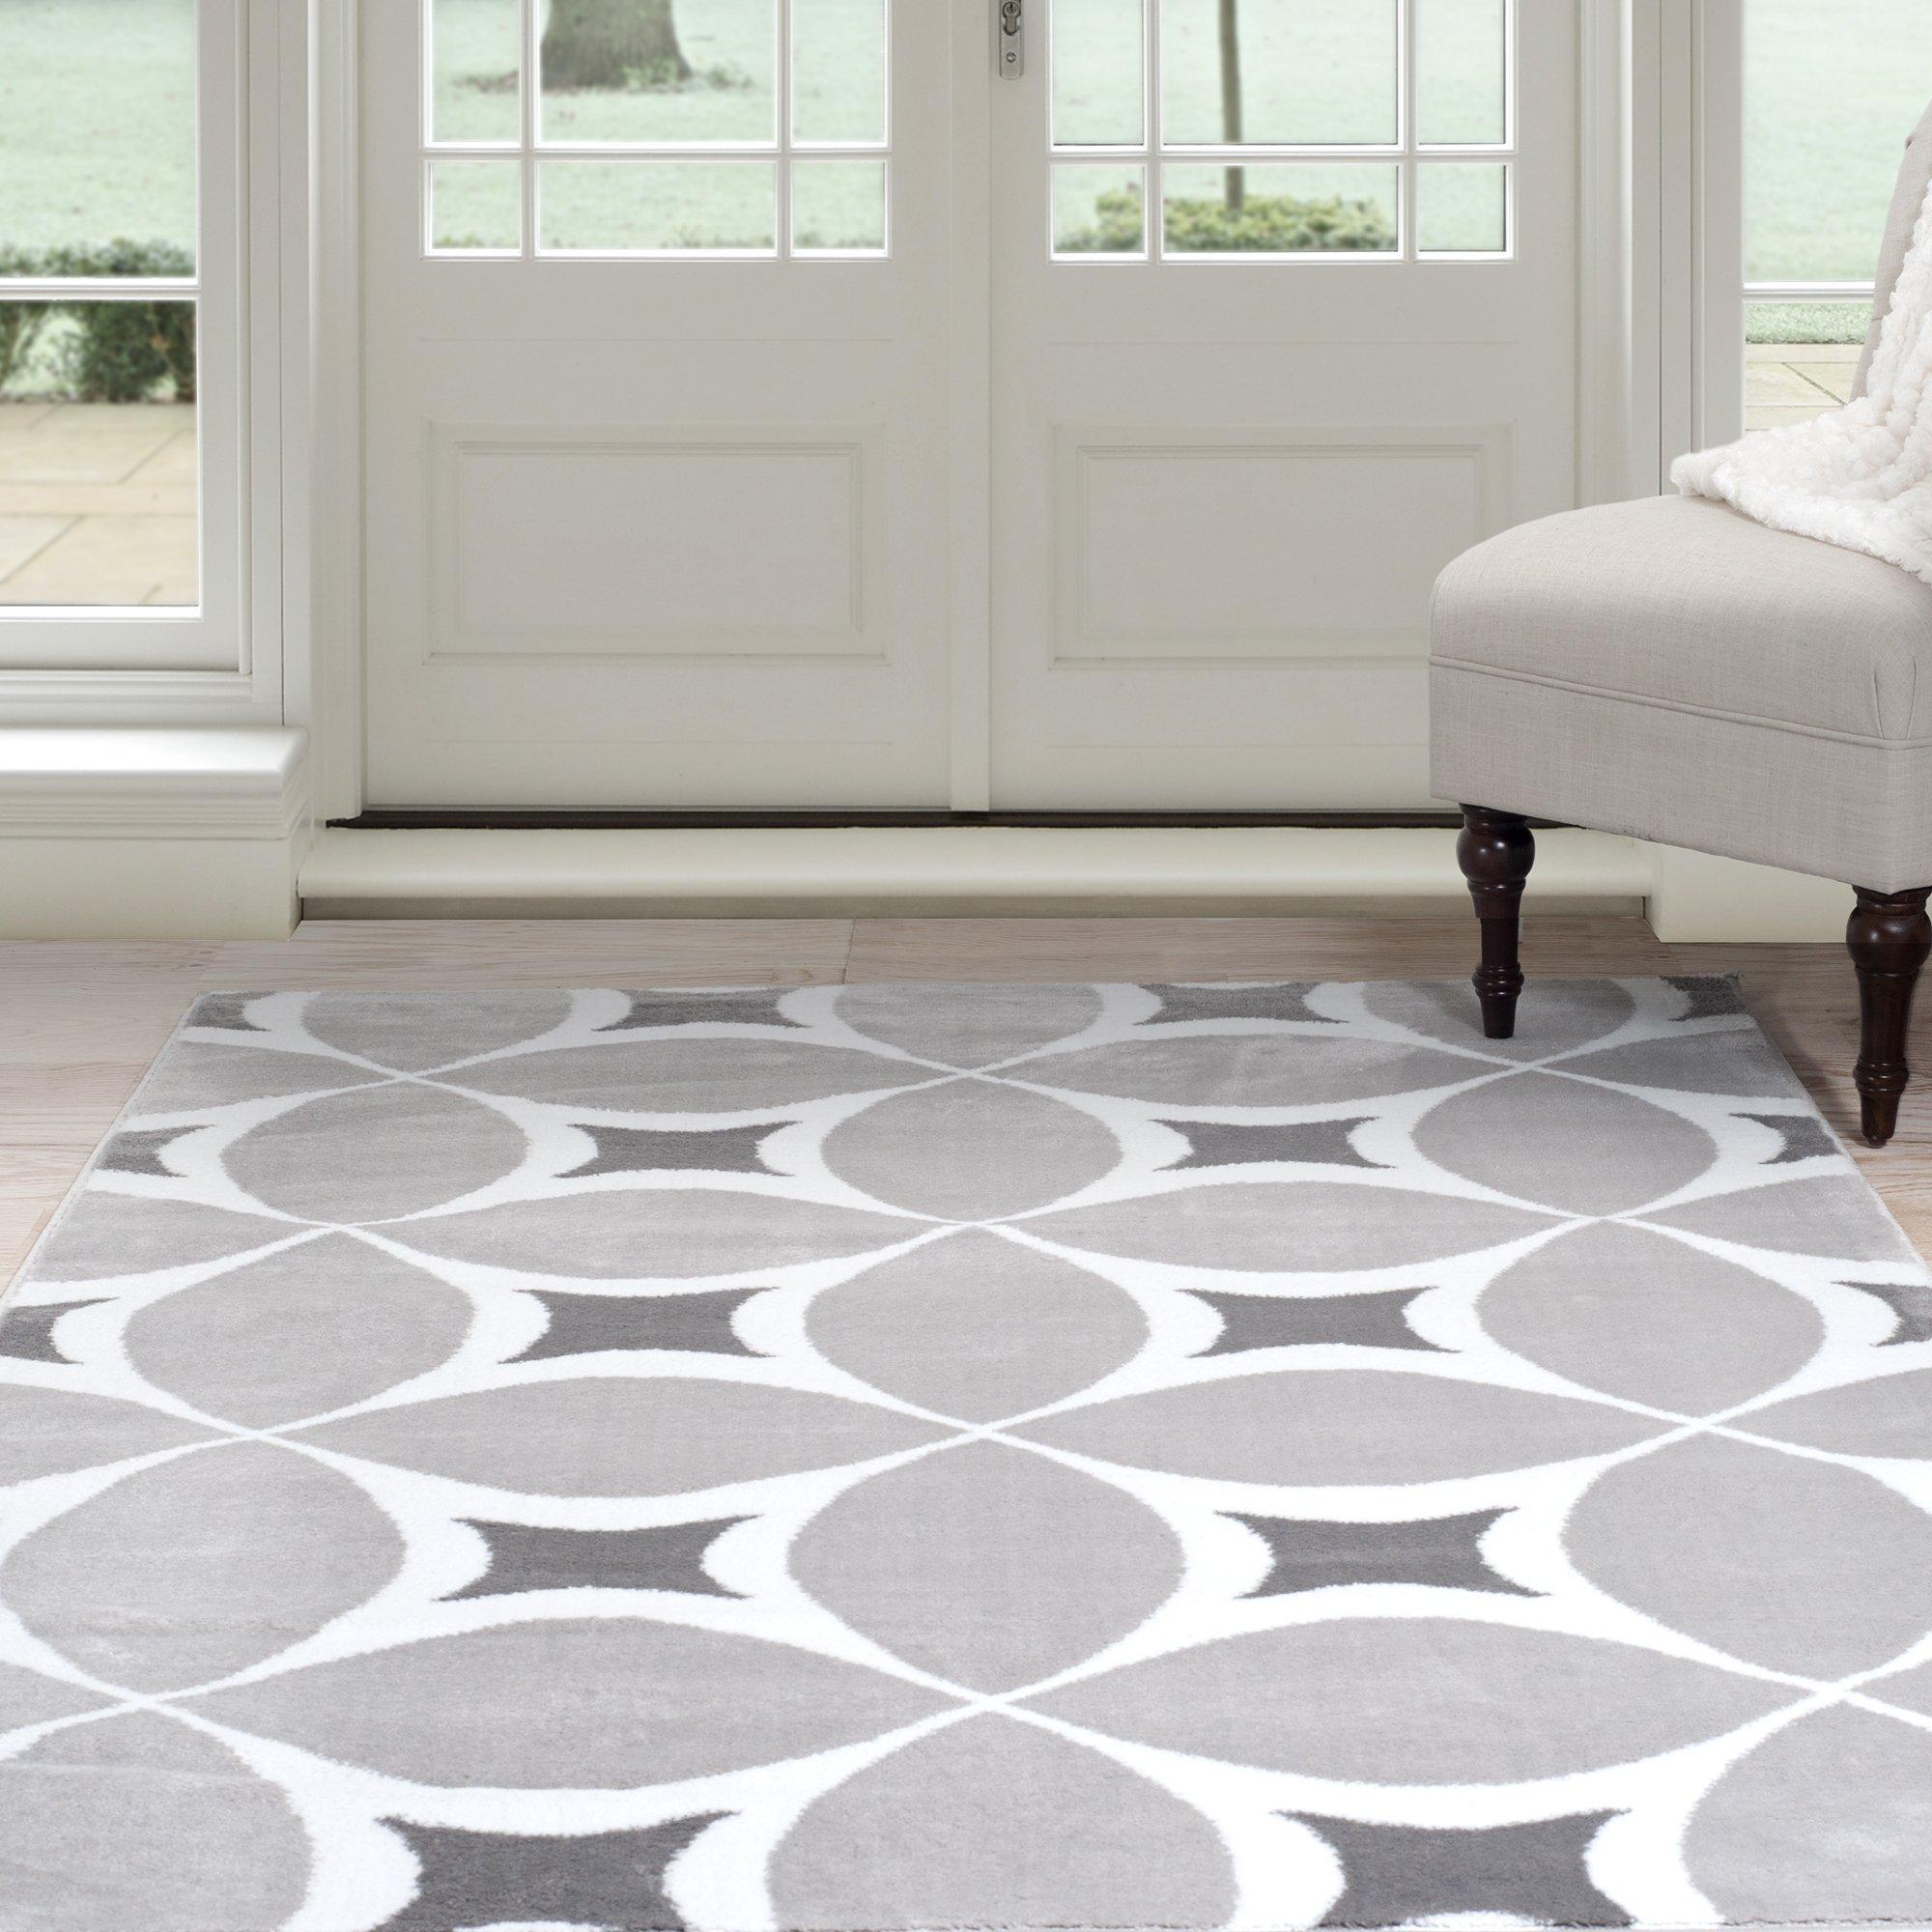 Lavish Home Geometric Area Rug, 4' by 6', Grey/White